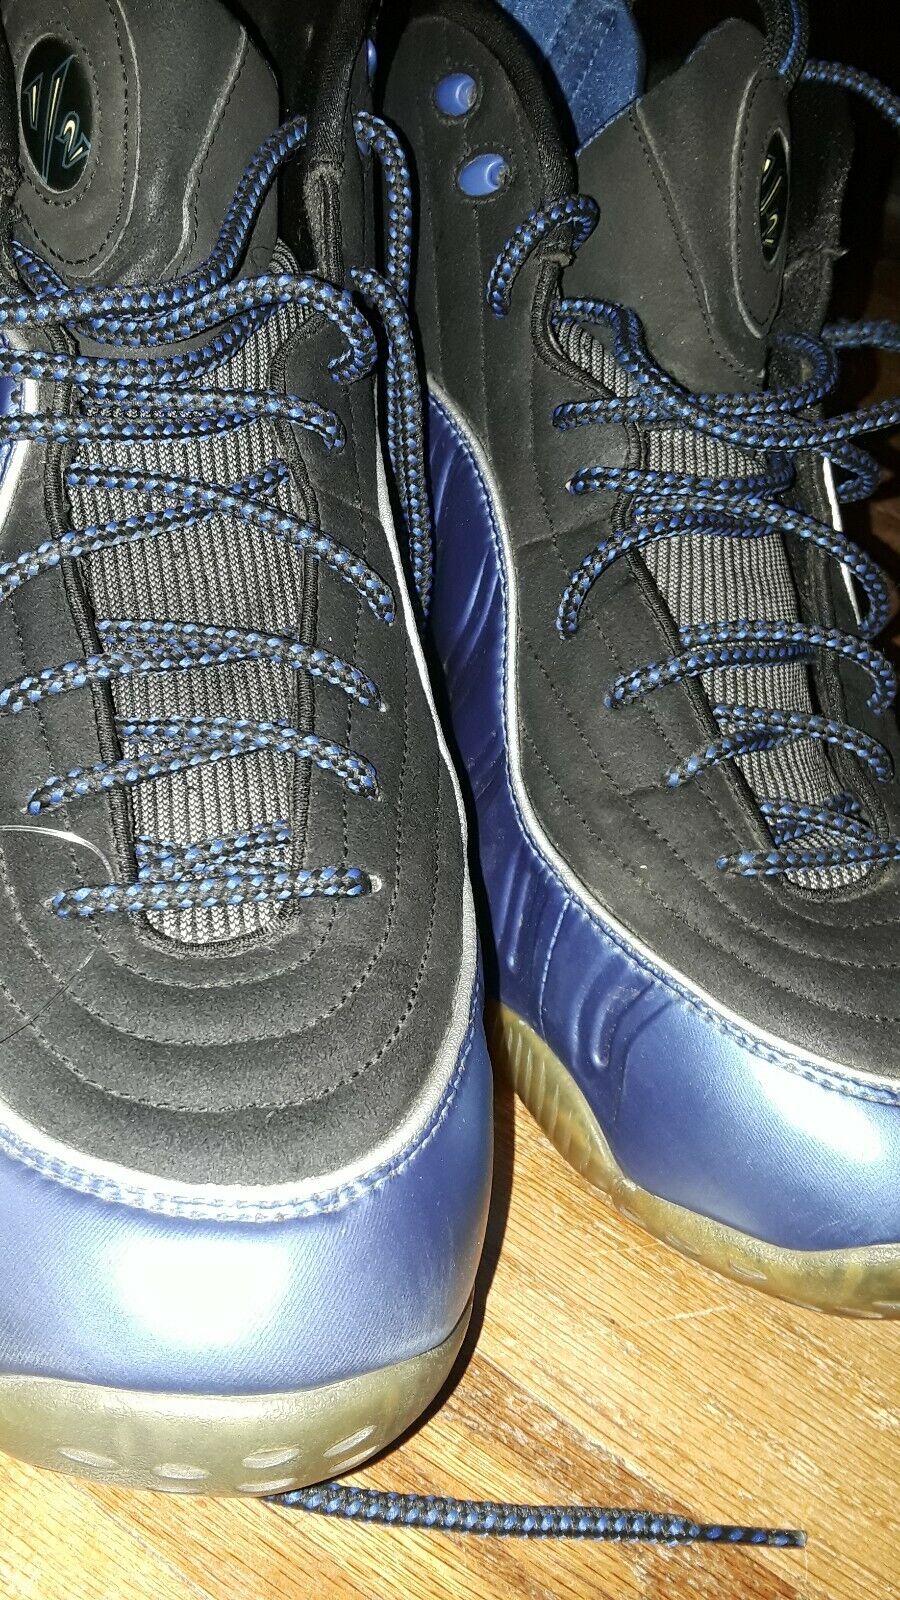 Nike Air Penny 1 2 Cent Varsity Royal Black Silver 344646-401 Foamposite 11.5